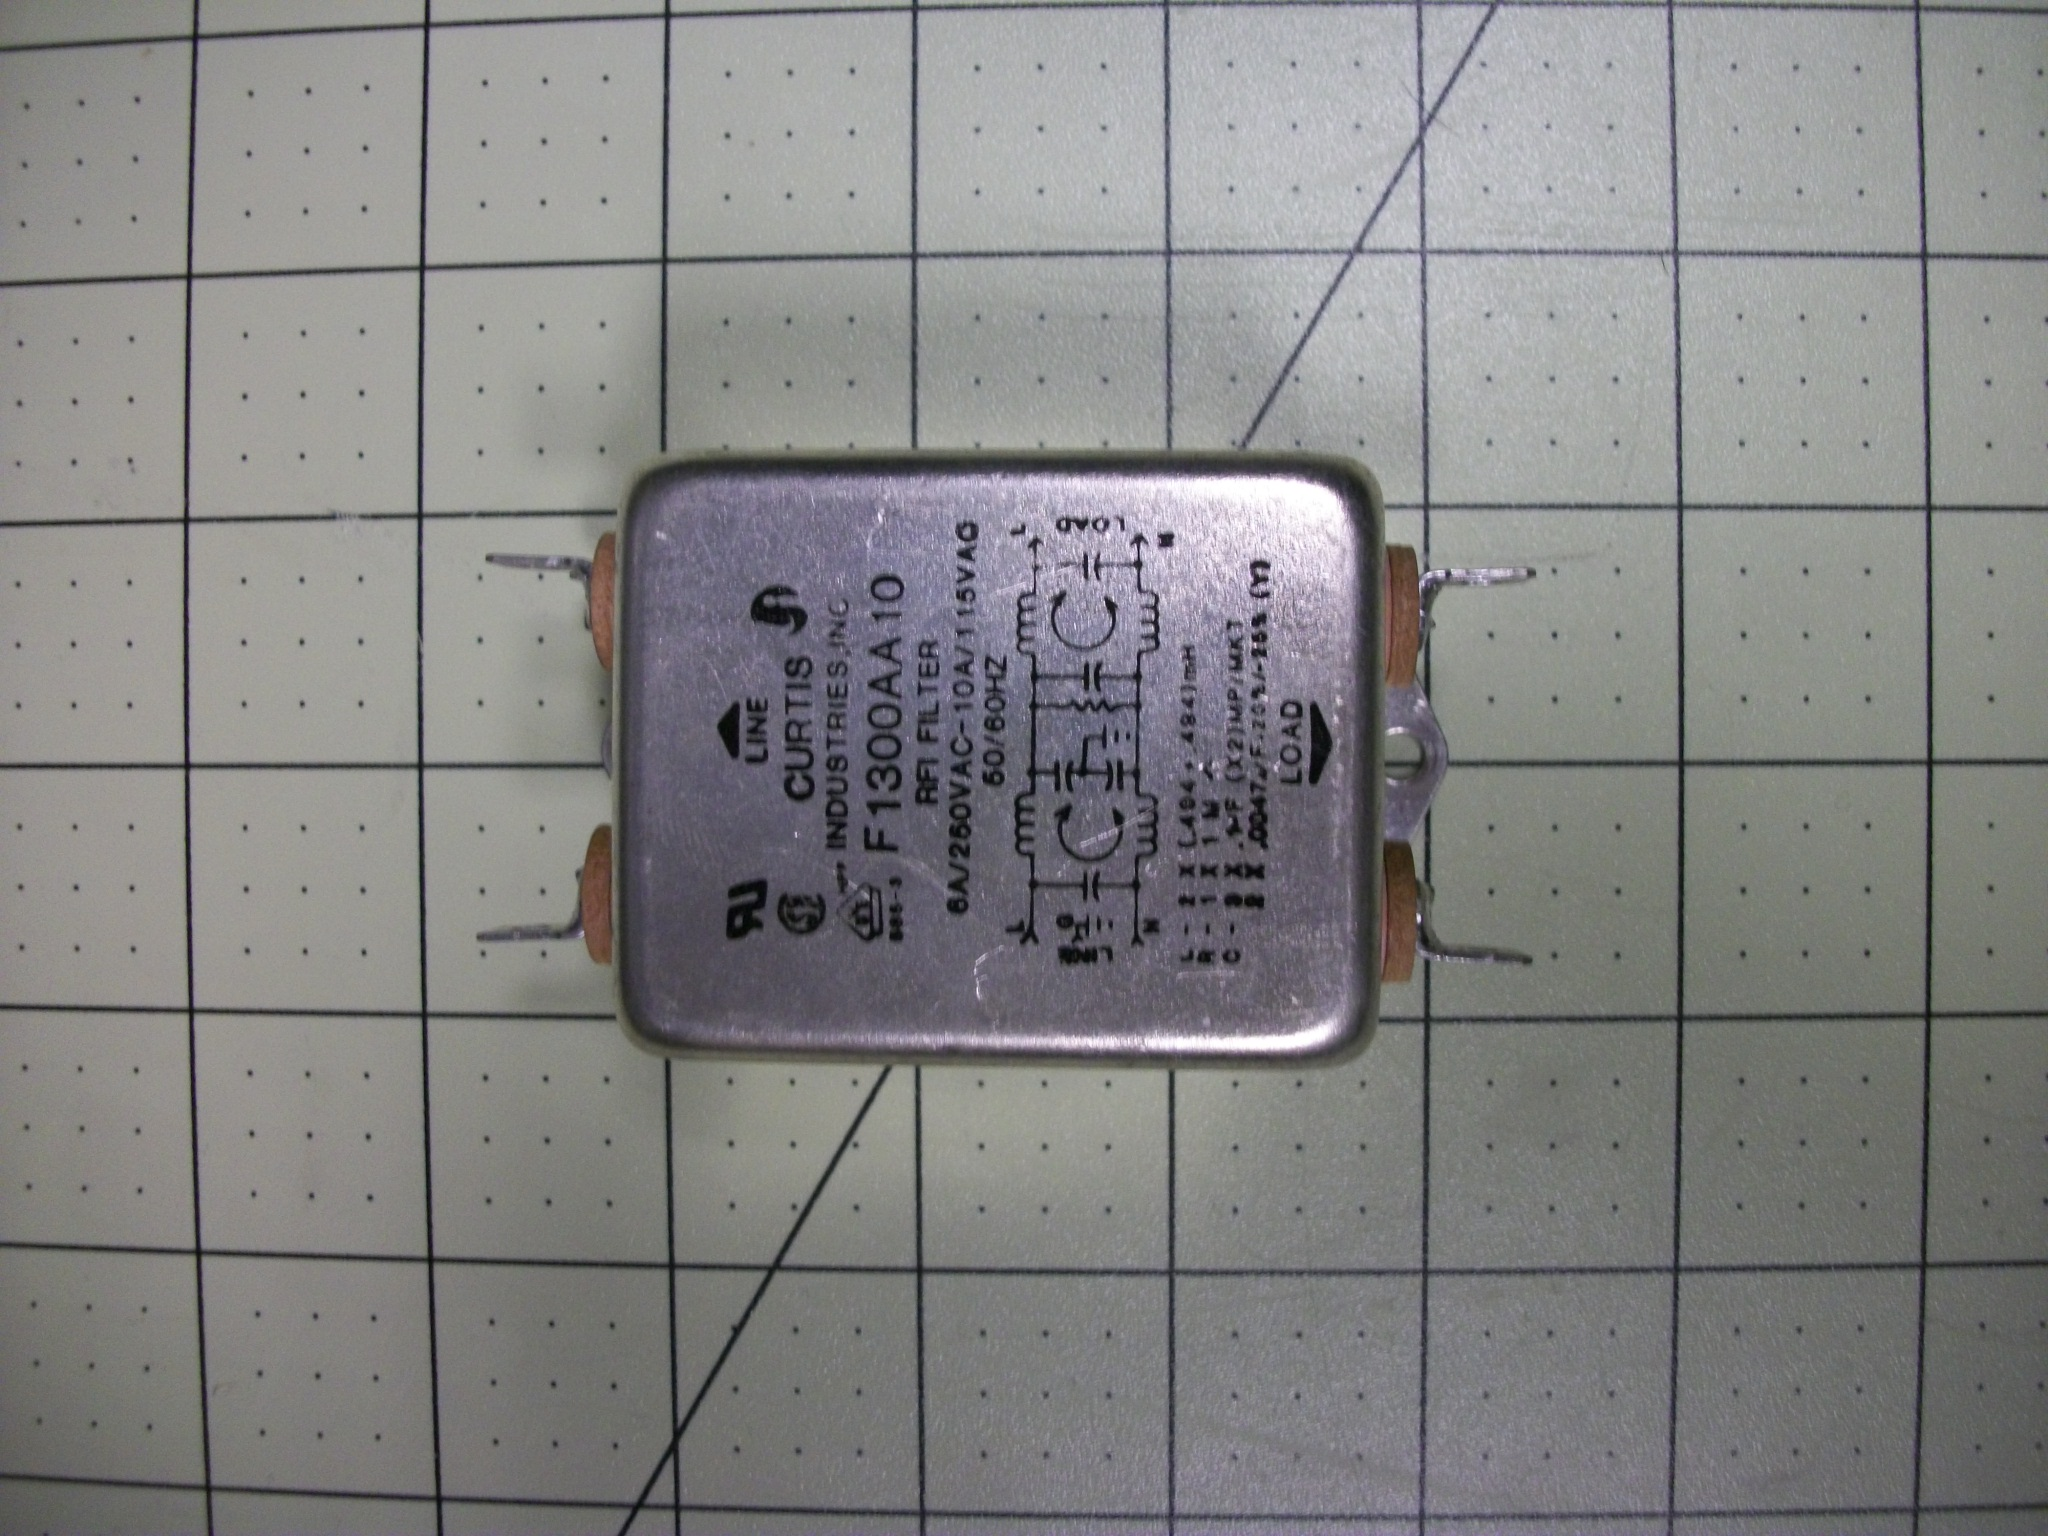 FLTR RFI 120VAC 10AMP QC/QC TERM